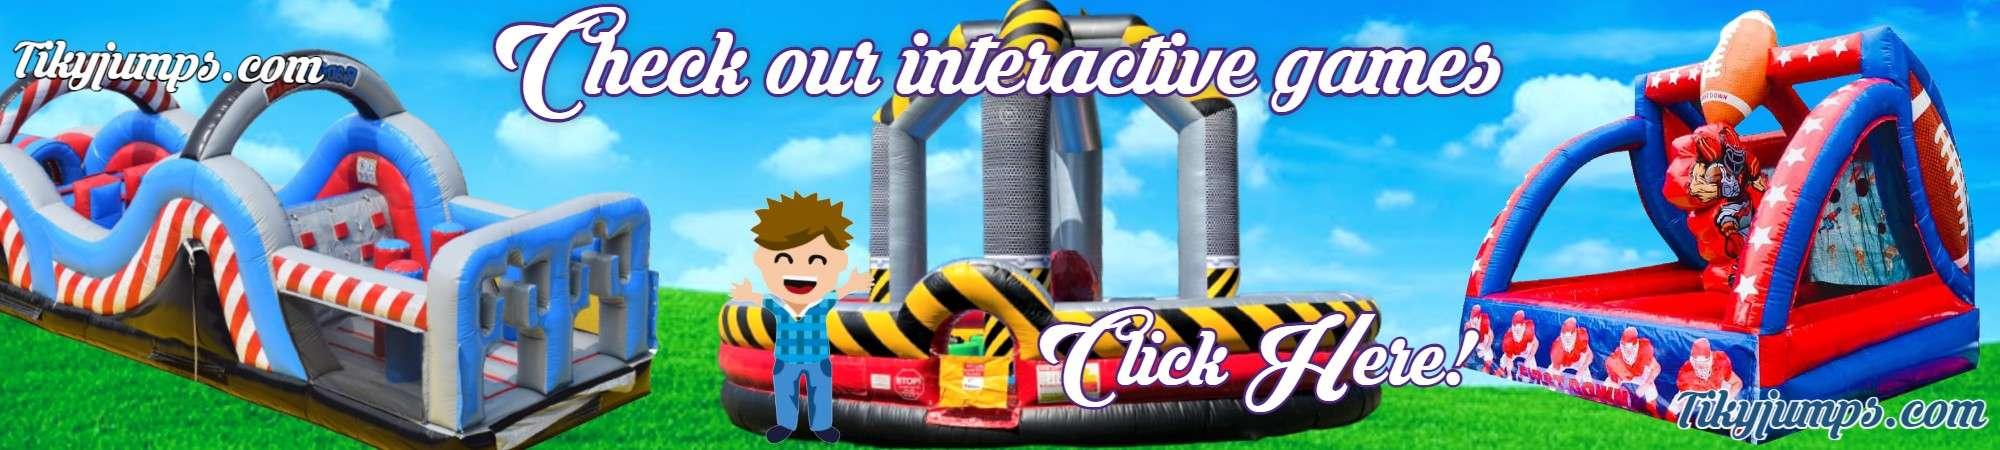 Interactive Games Rentals